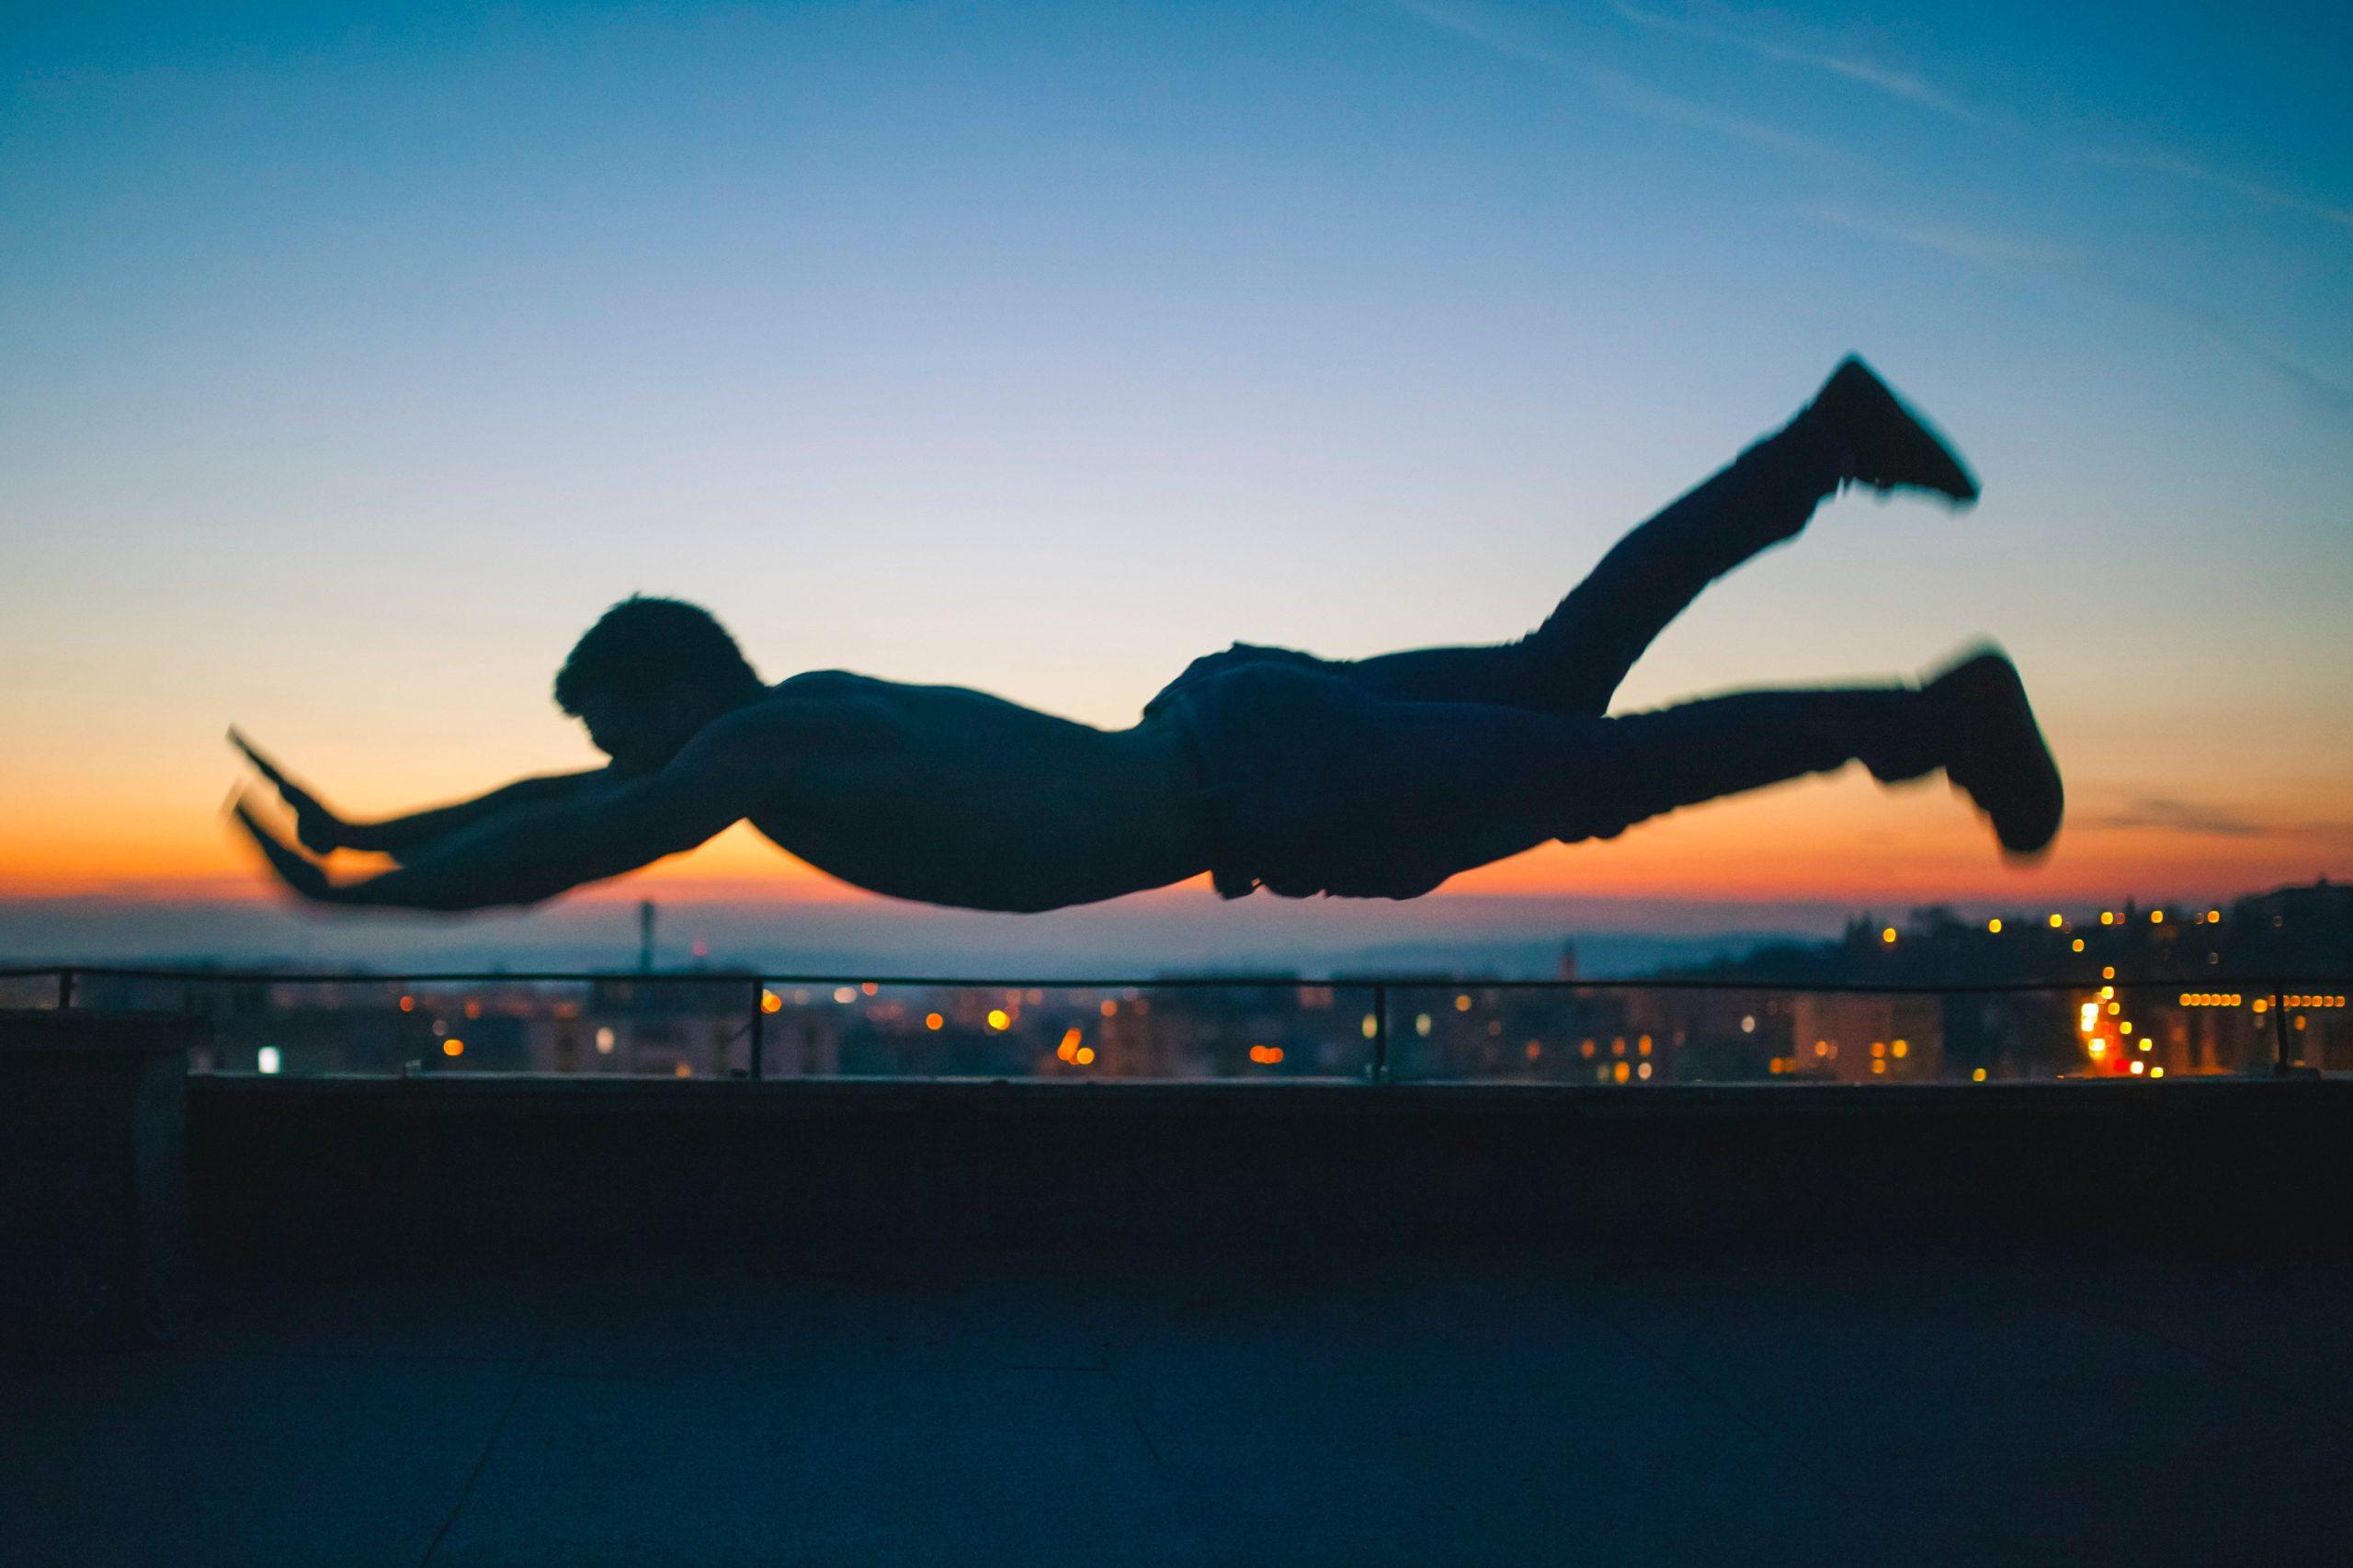 A man falling